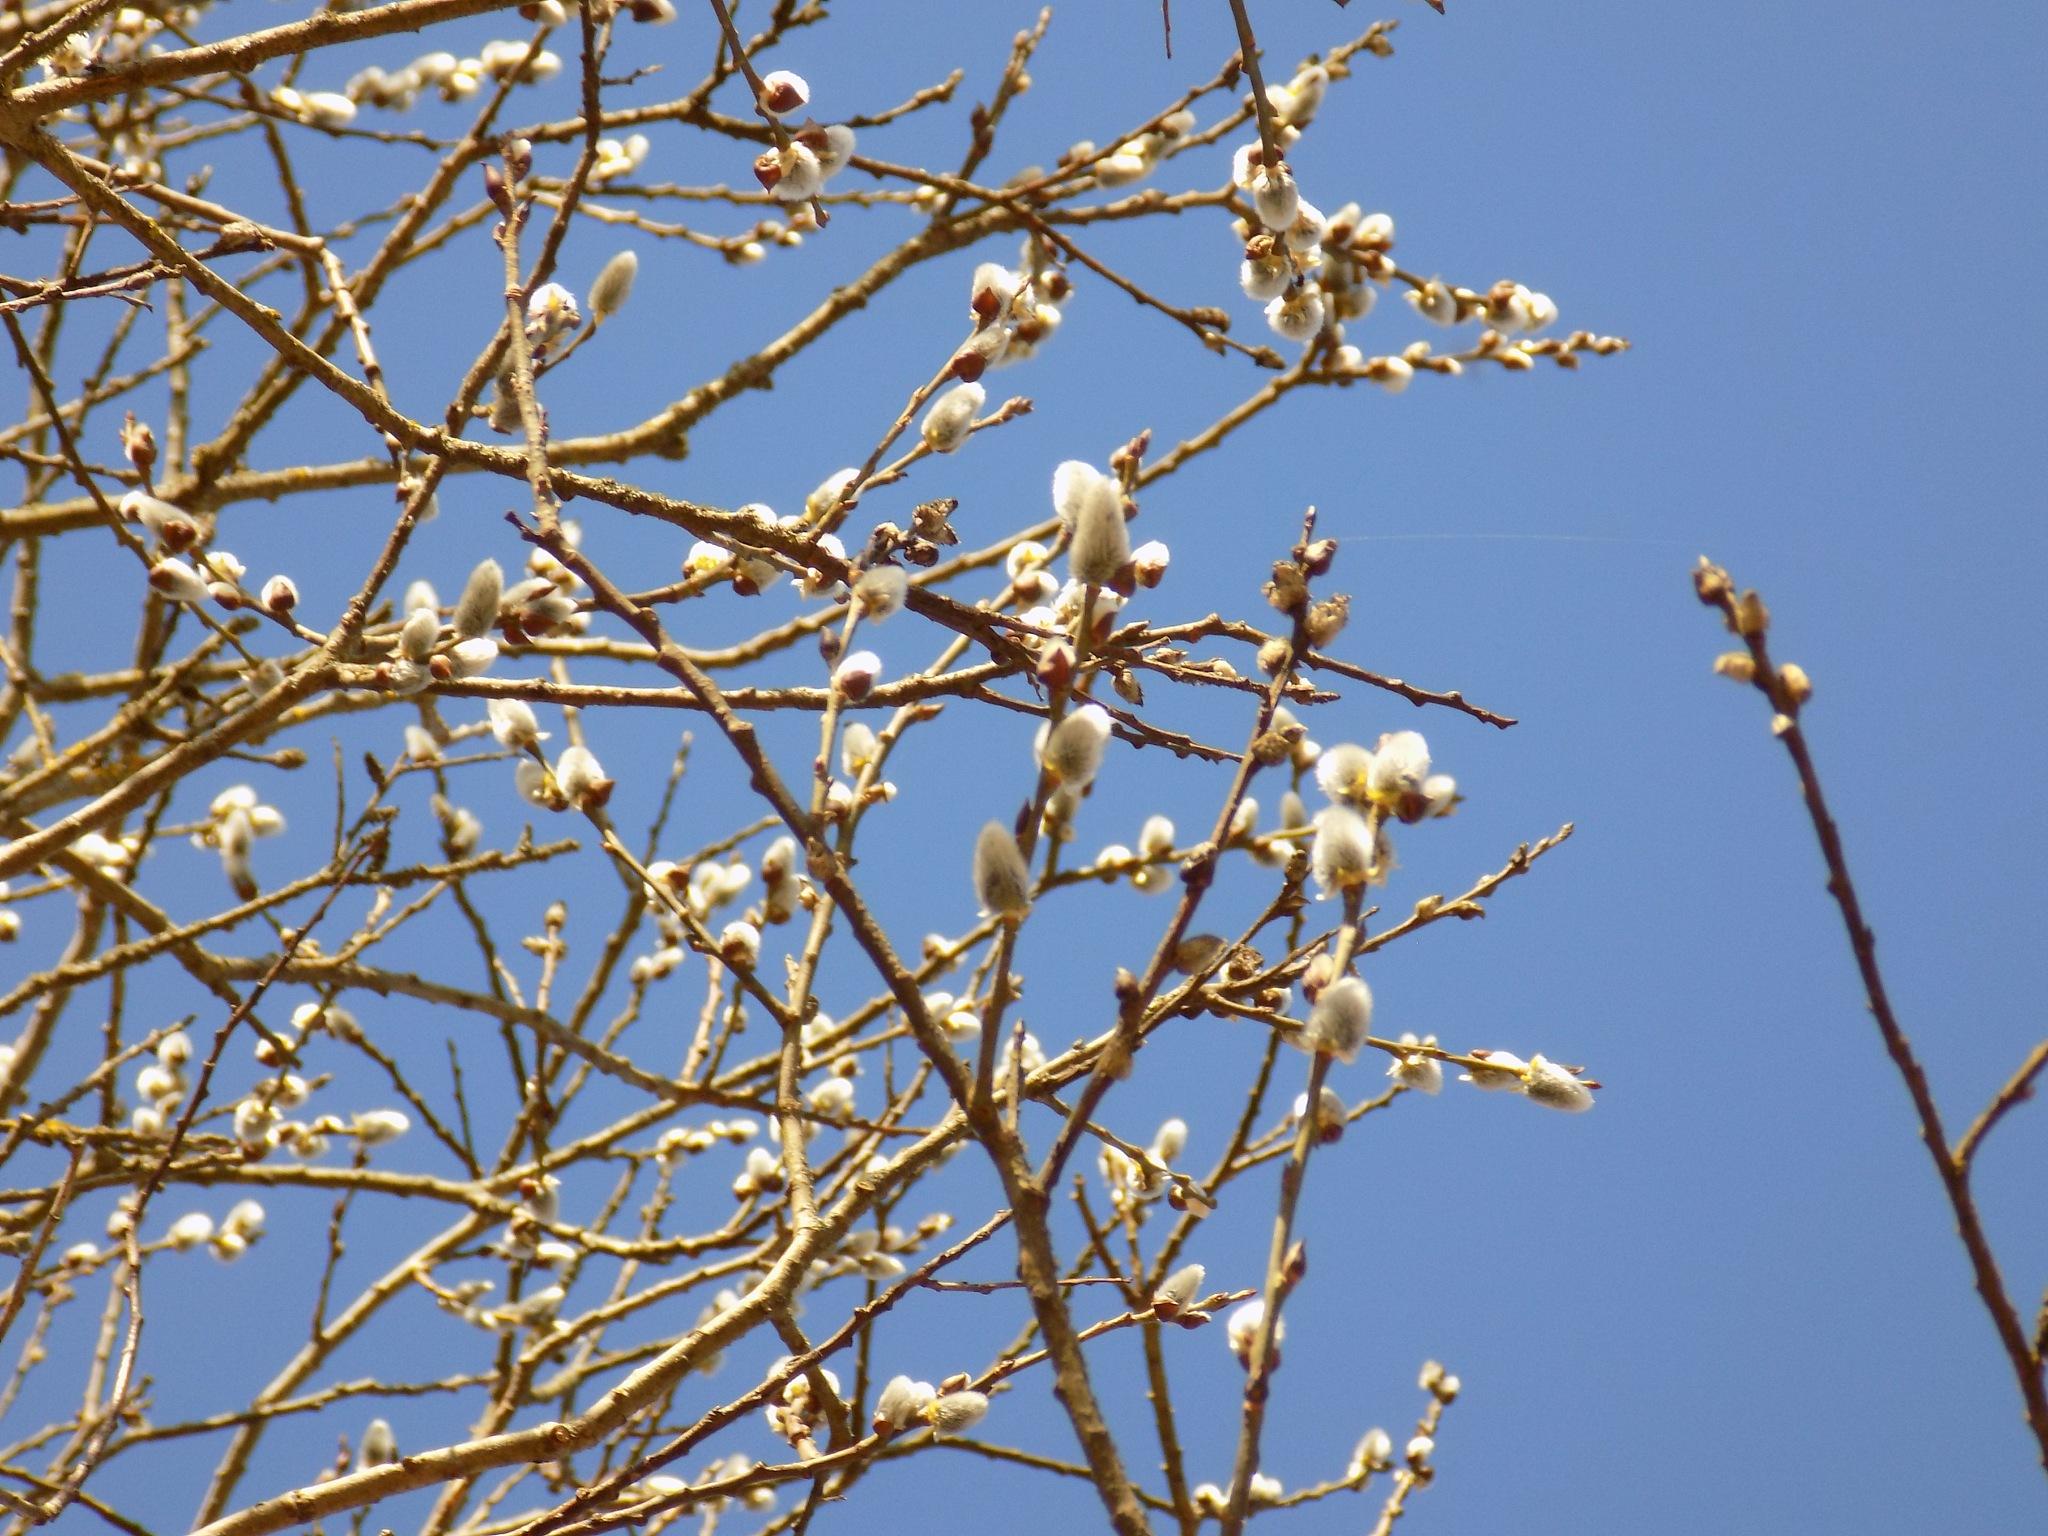 Ivy in the spring by uzkuraitiene62